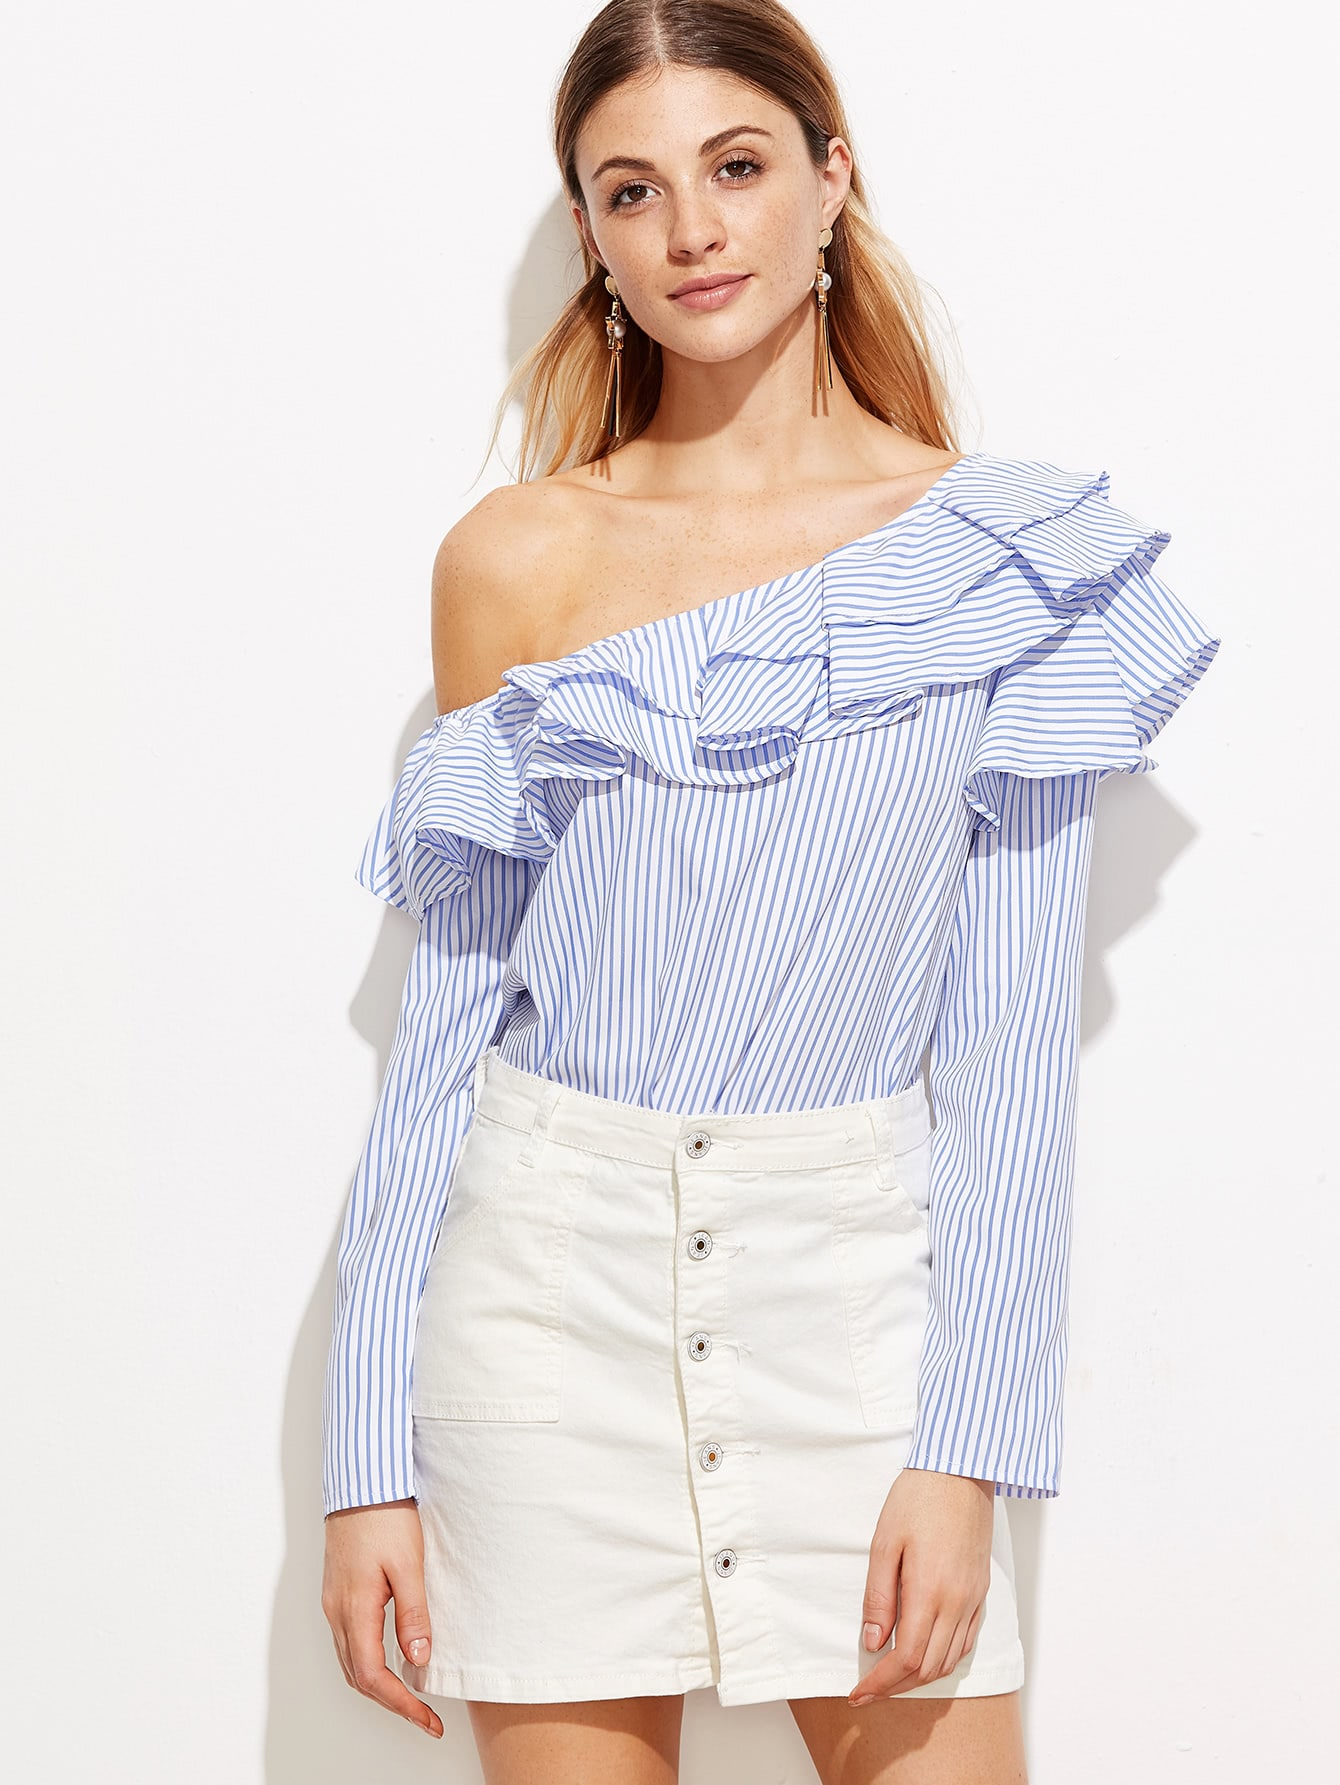 blouse161031101_2